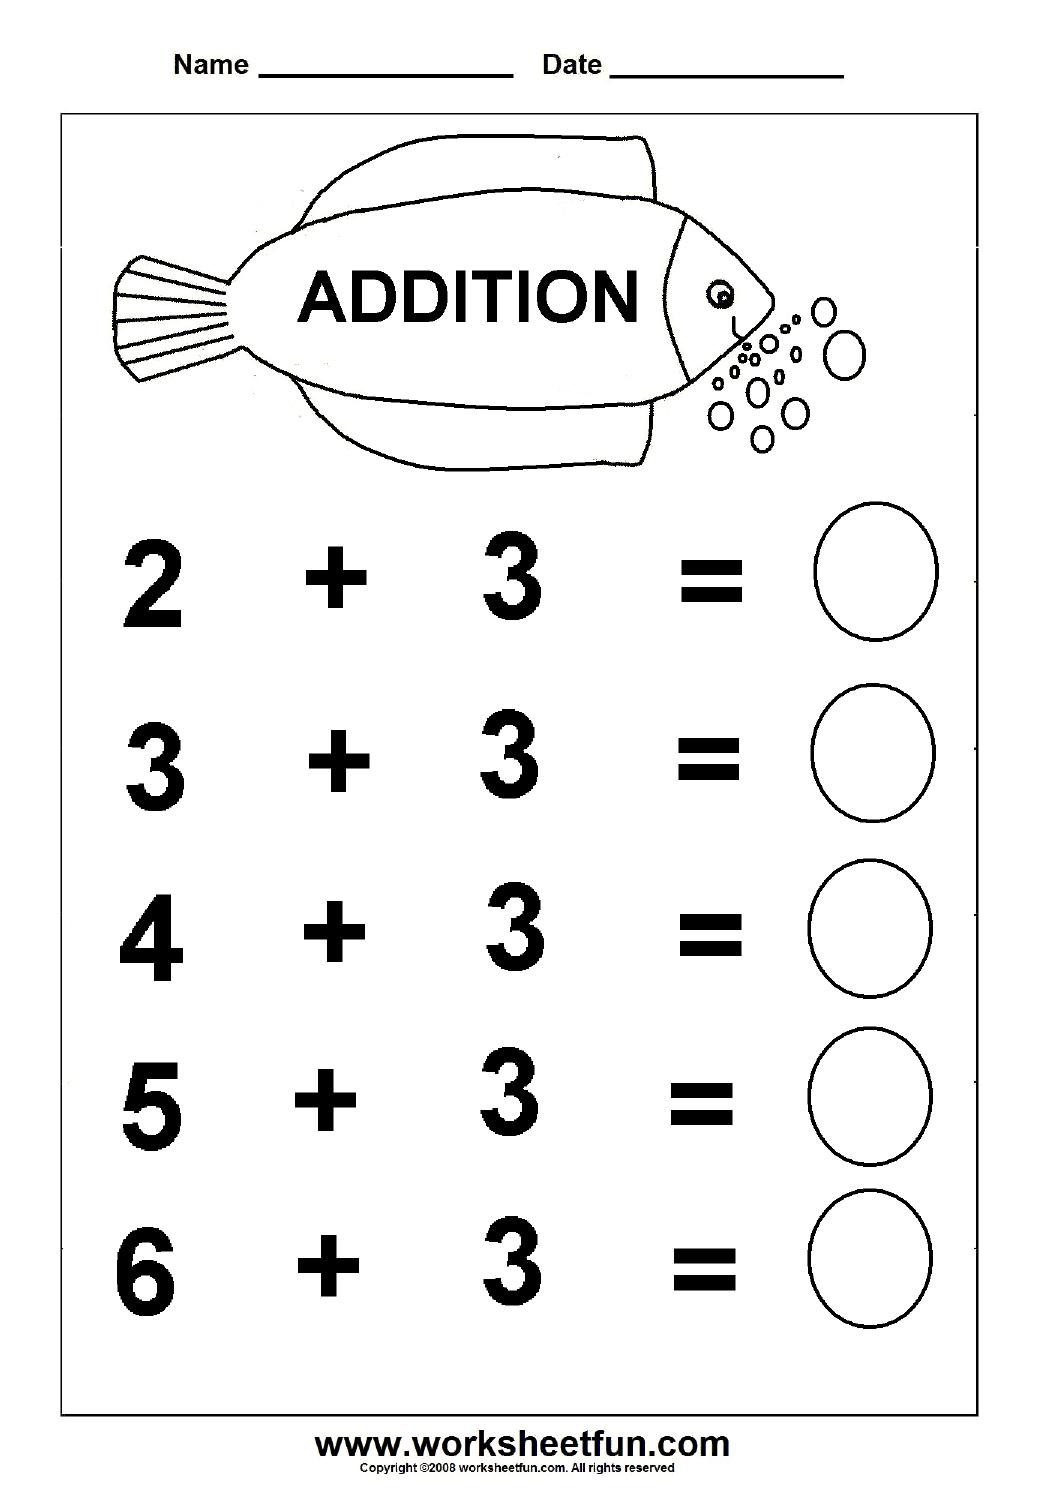 Beginner Addition – 6 Kindergarten Addition Worksheets / Free | Free Printable Preschool Addition Worksheets